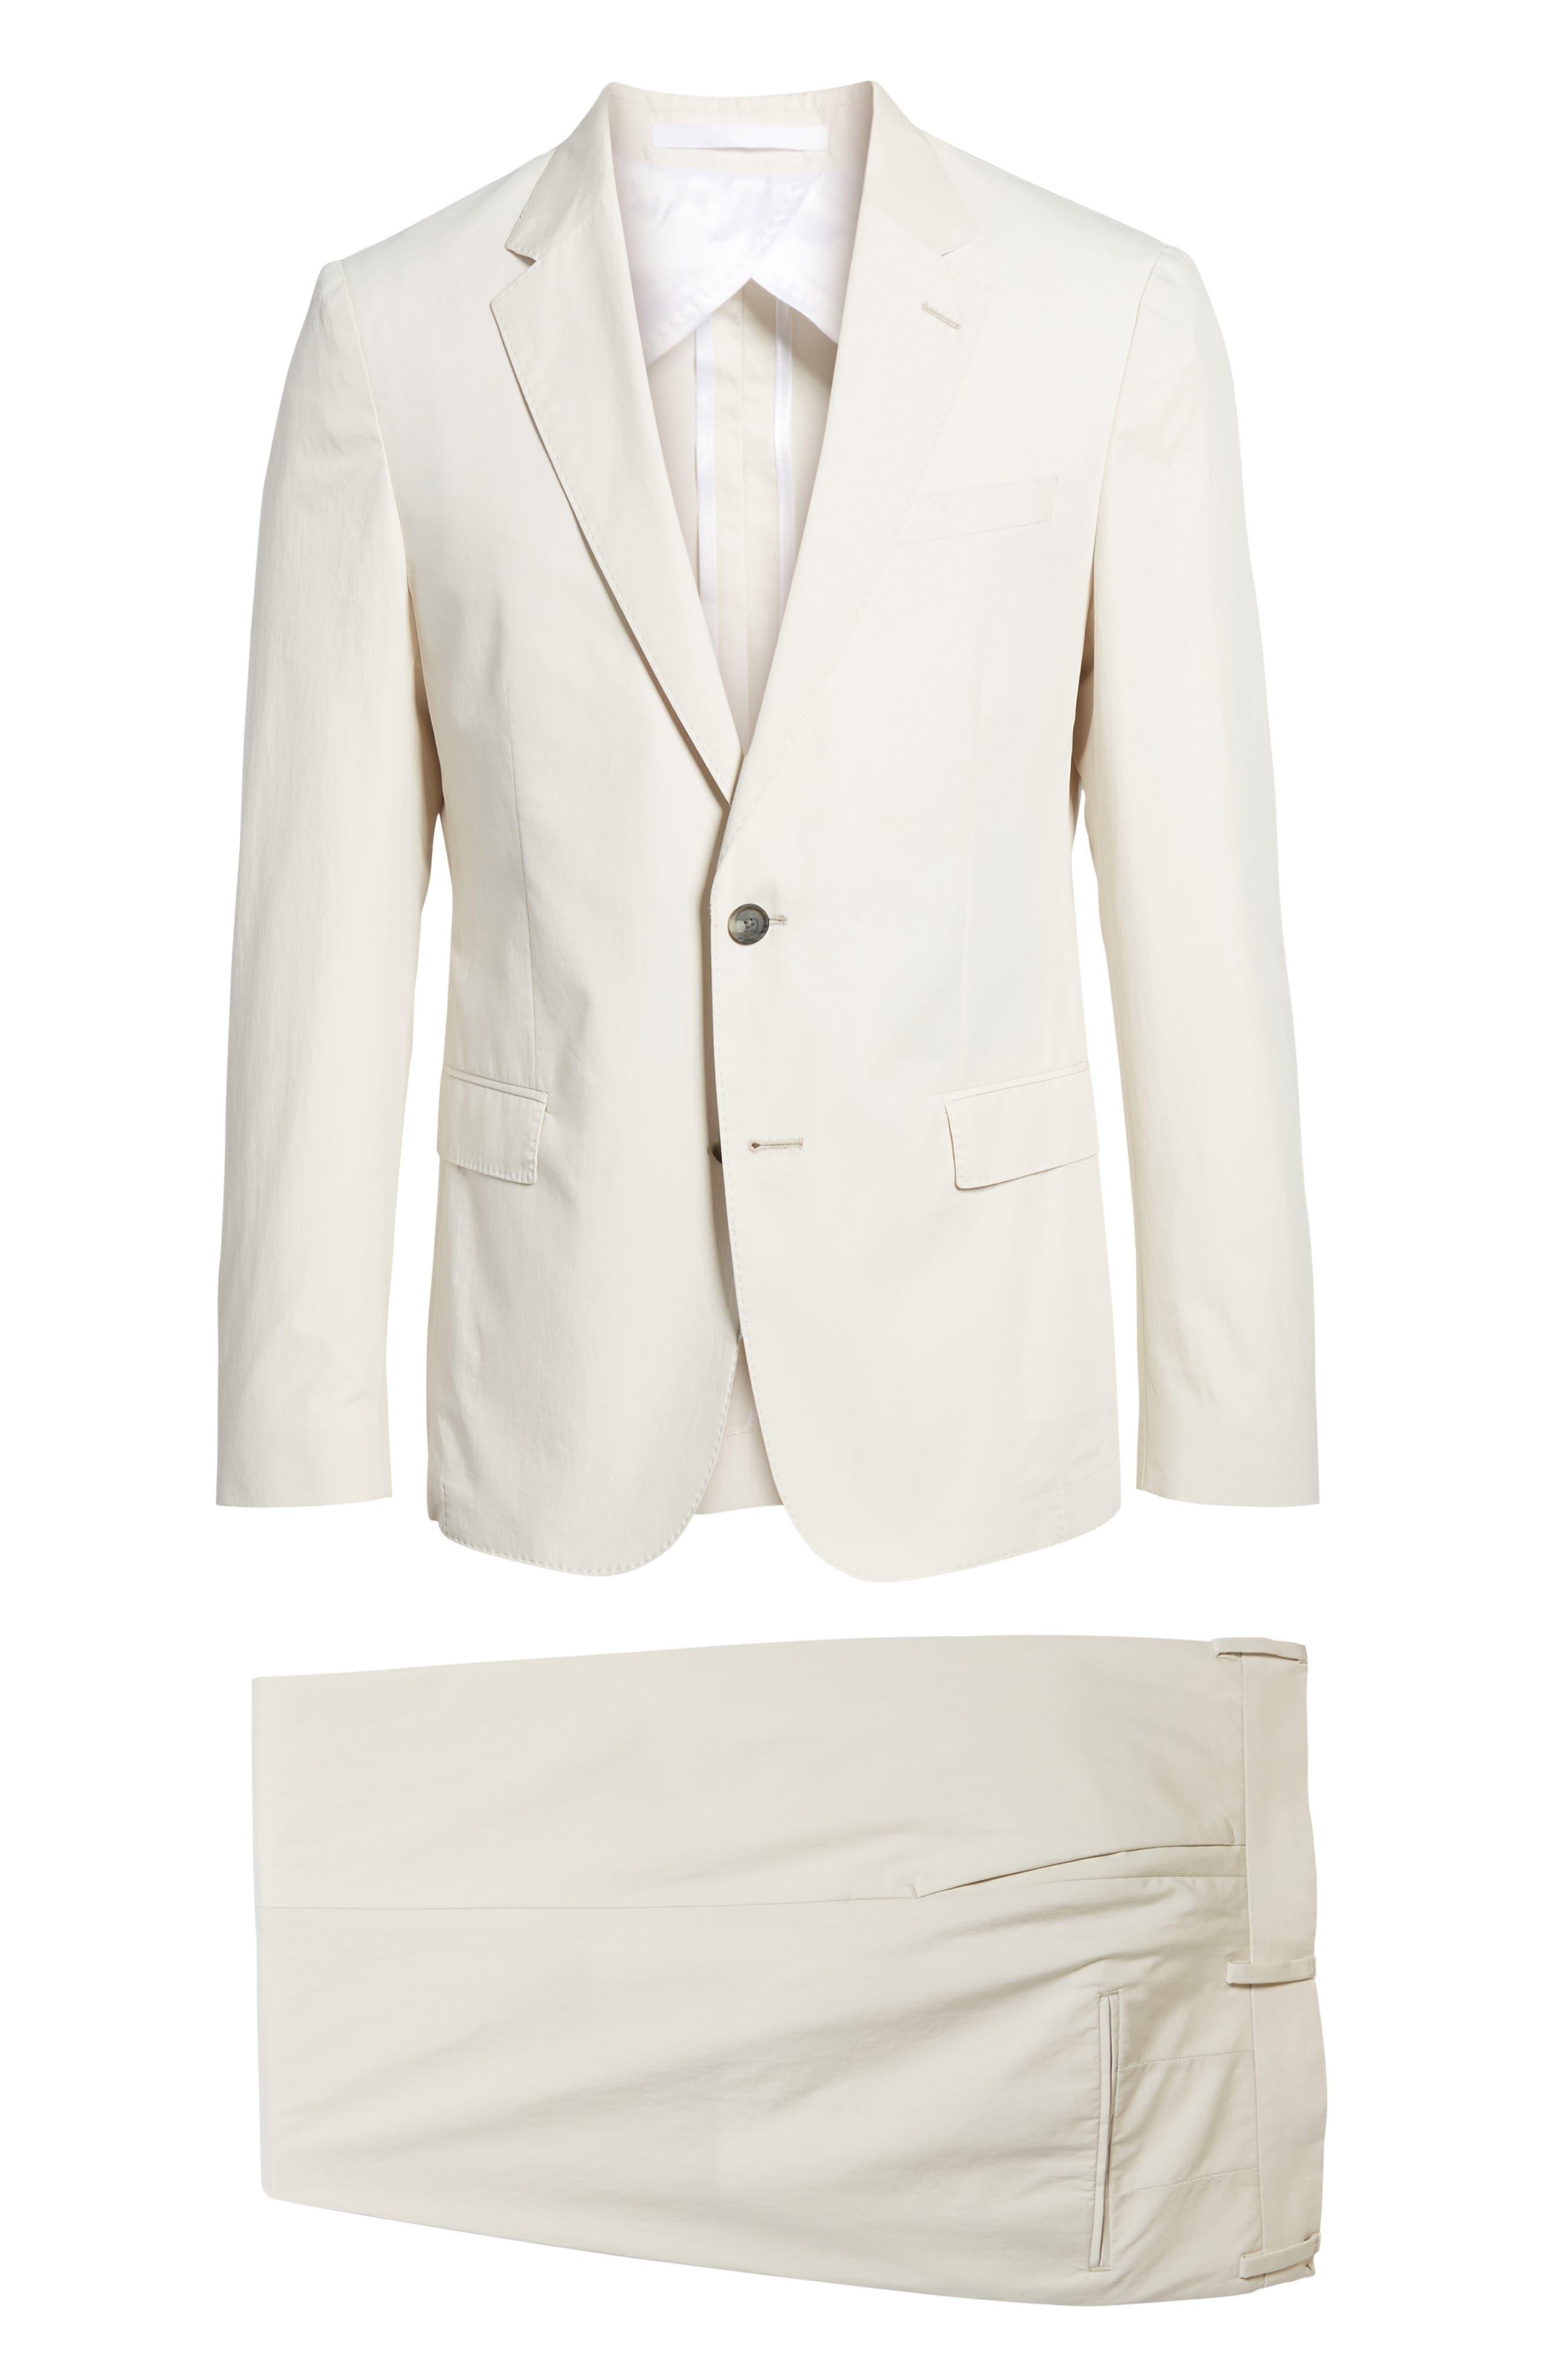 Nylen/Perry Trim Fit Solid Cotton Suit,                             Alternate thumbnail 8, color,                             Ivory